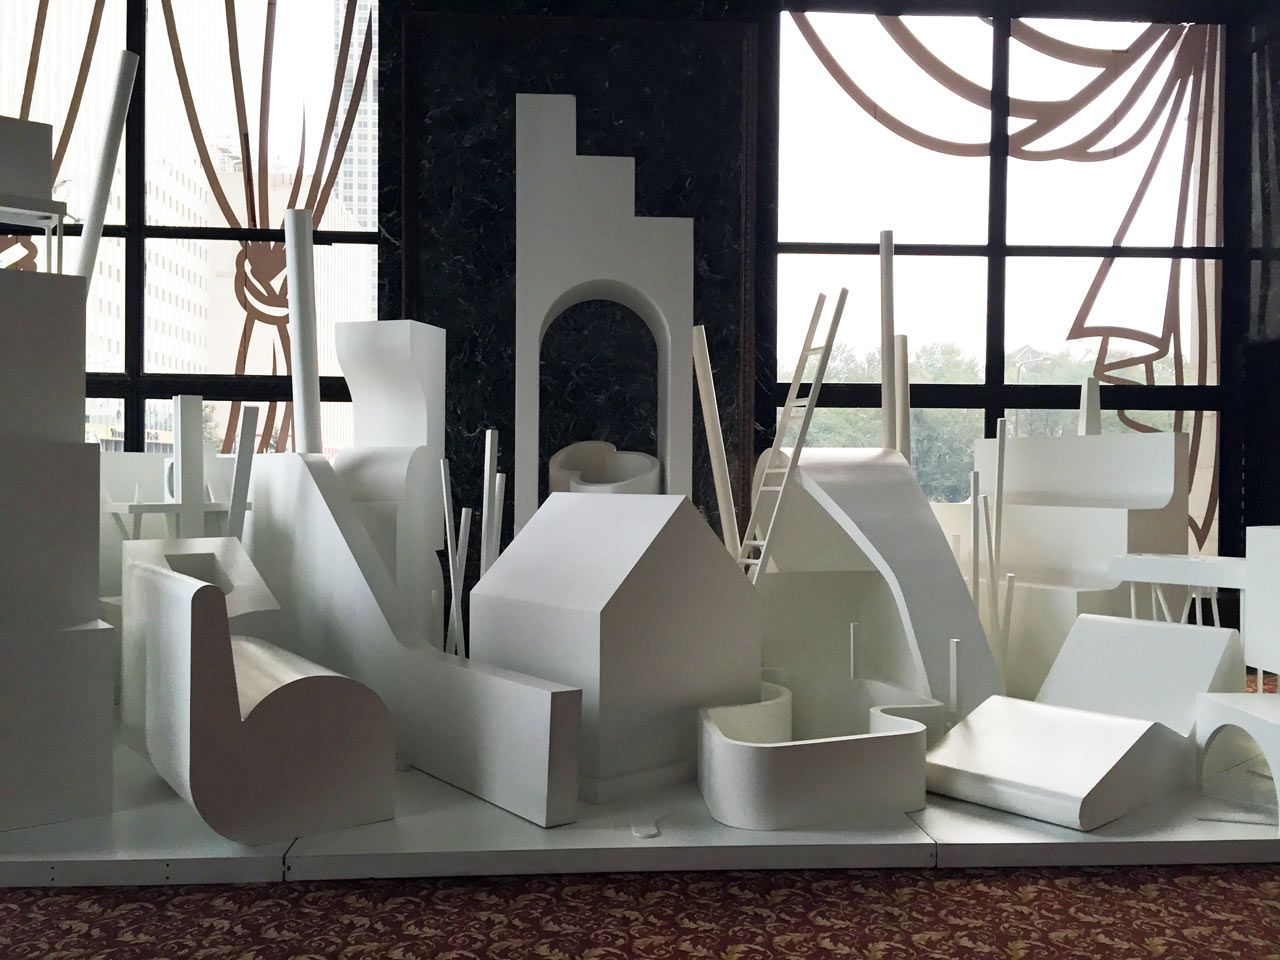 Chicago arch trip bureau spectacular furniture coworking